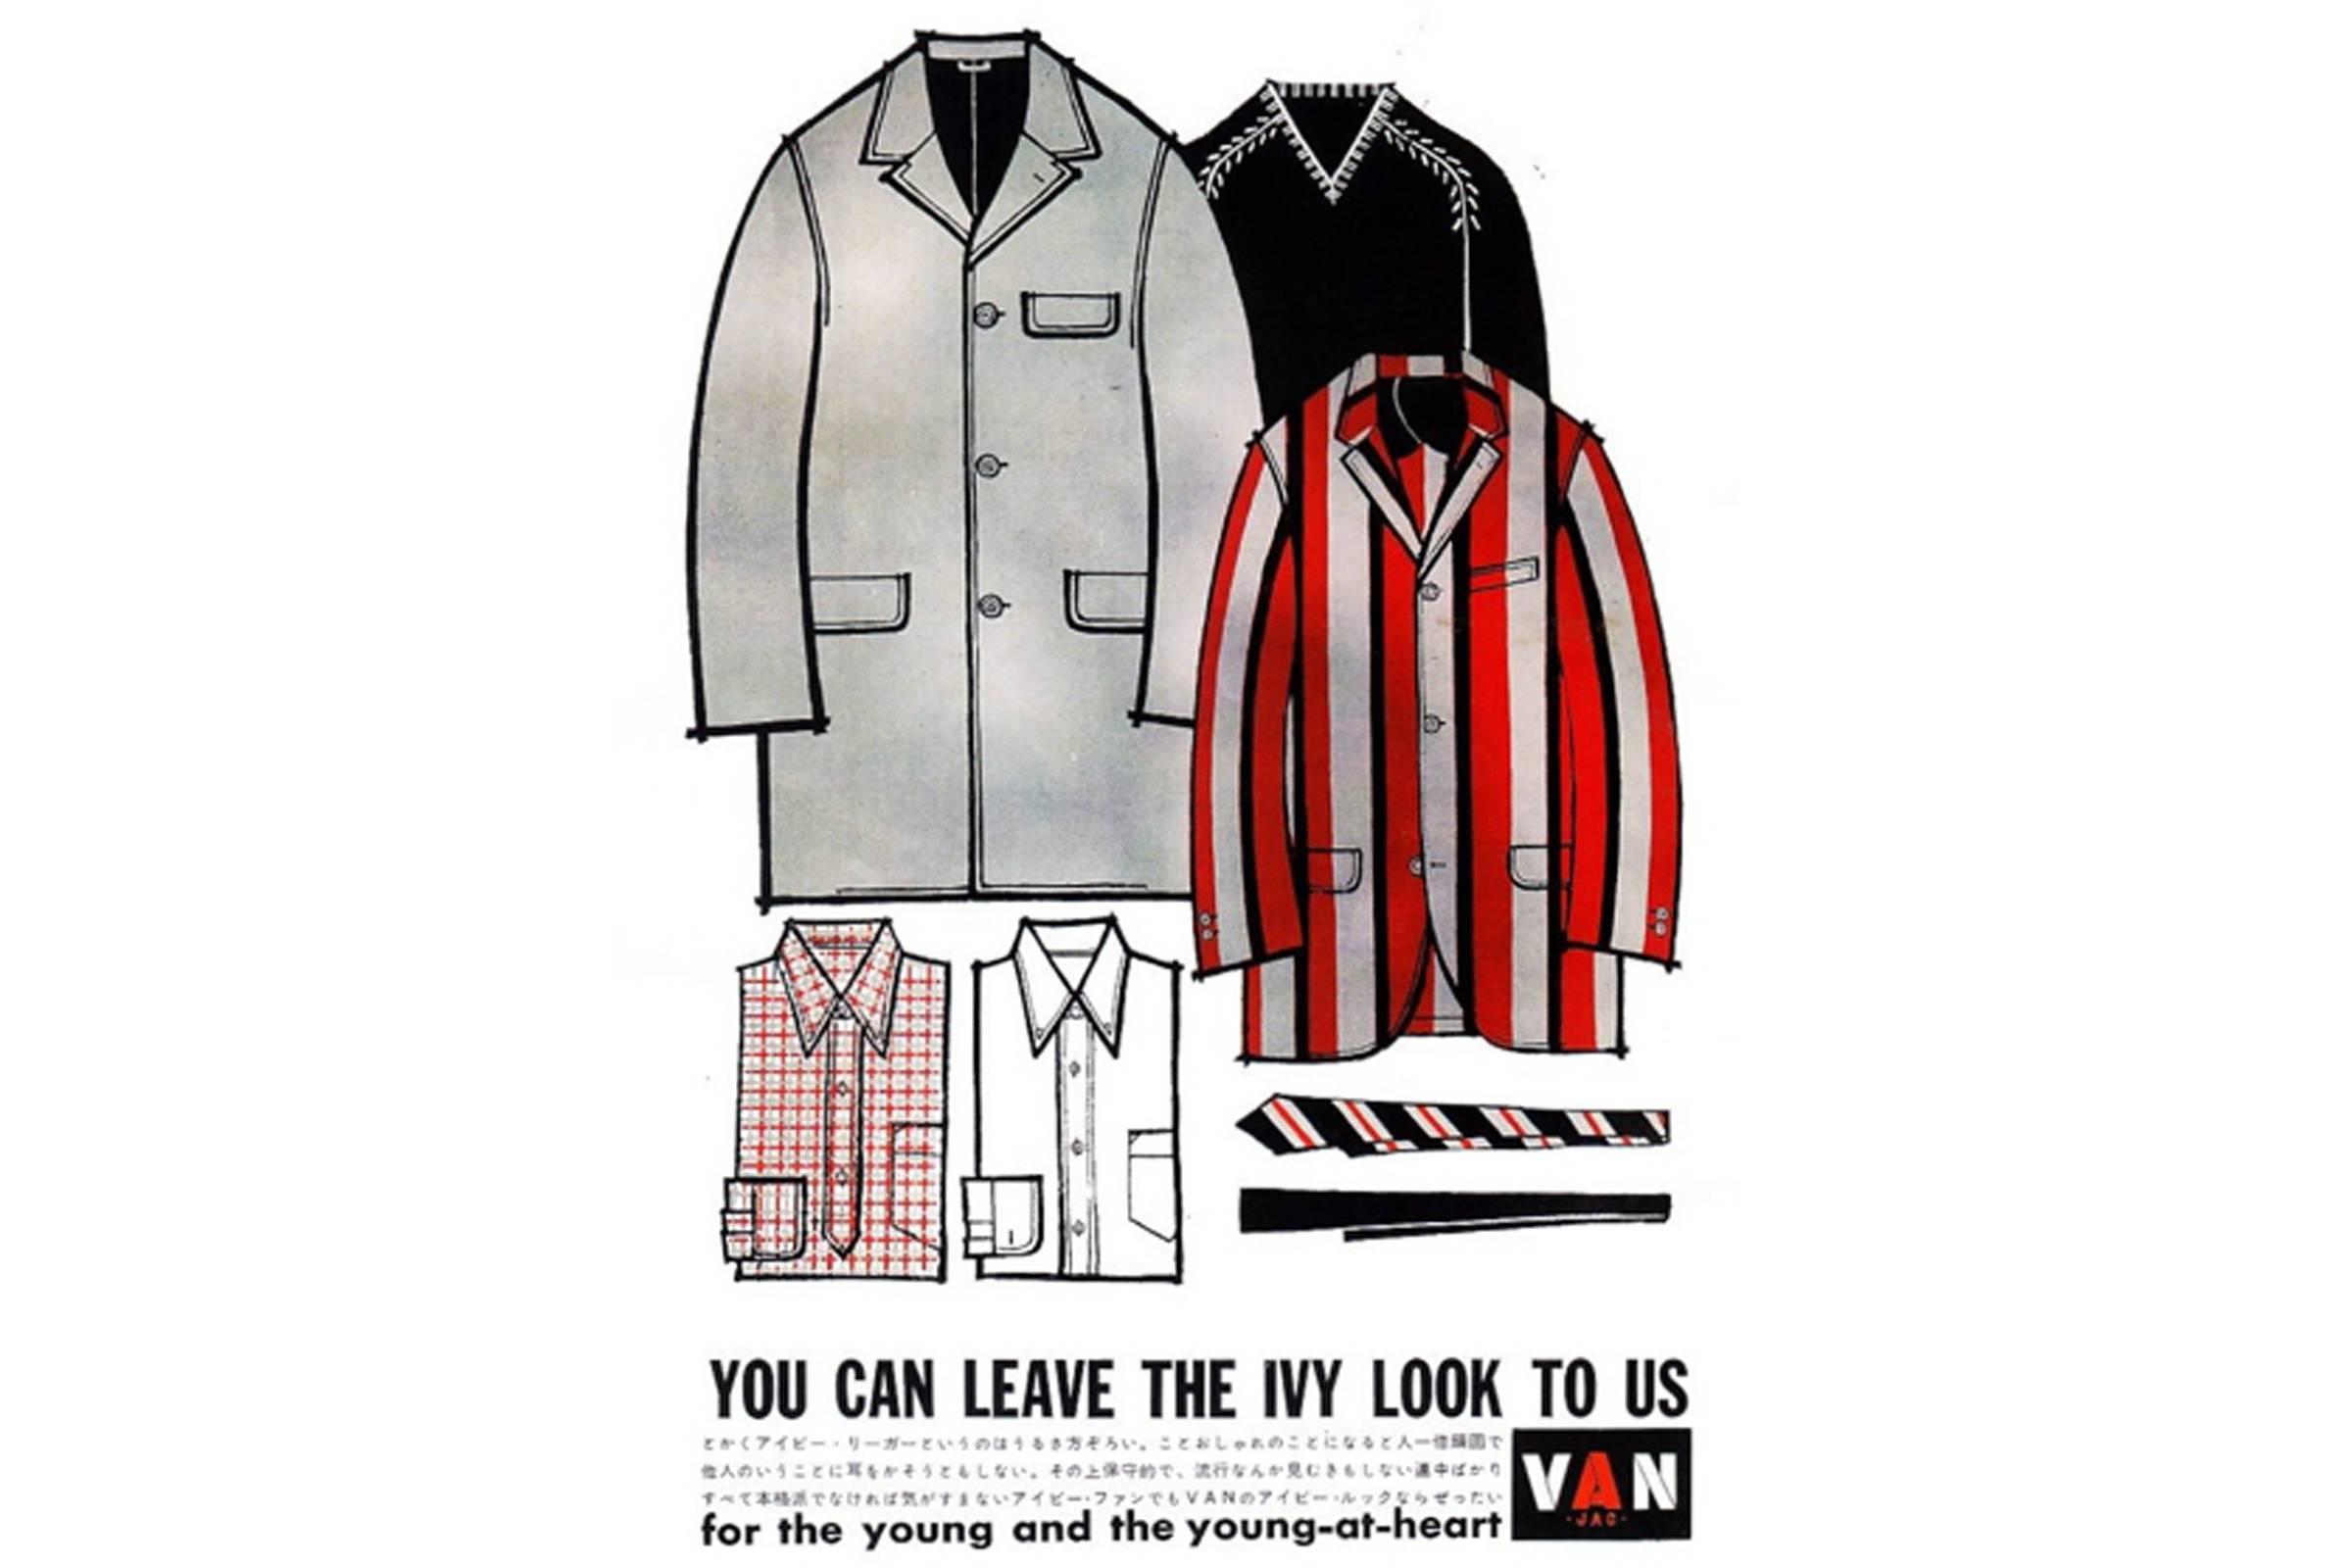 VAN Jacket ad